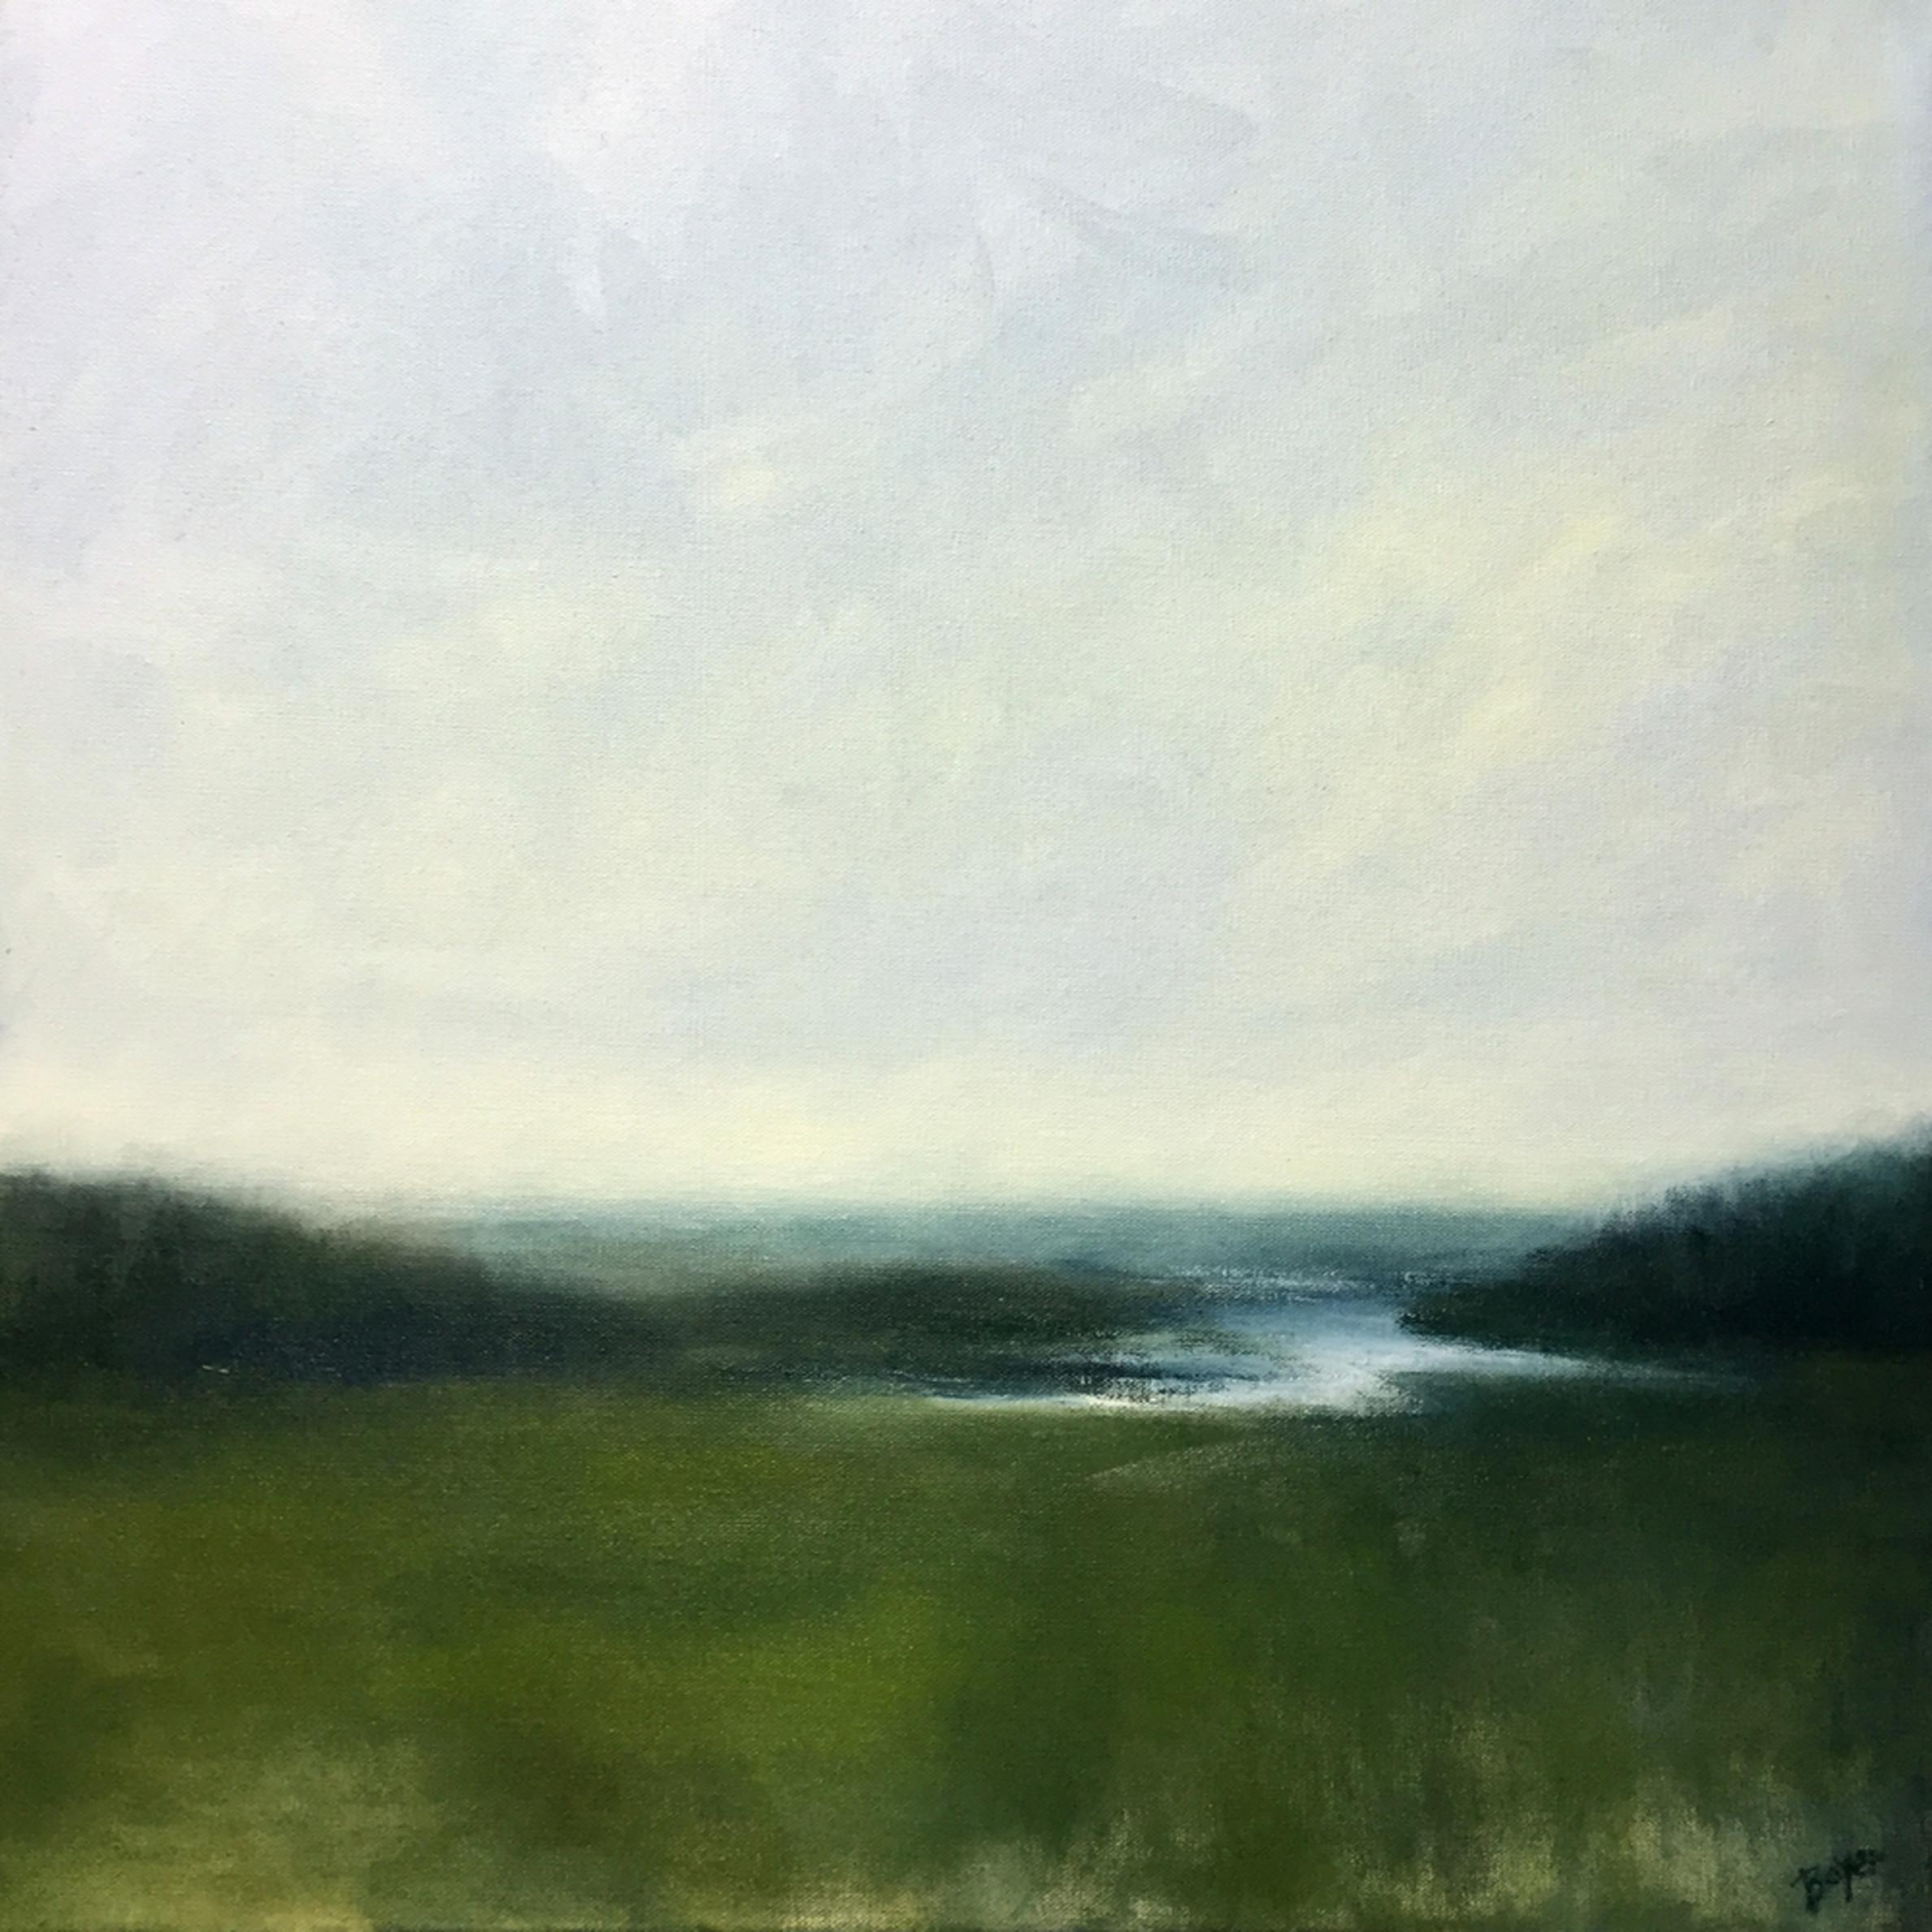 Dawn boyer reaching solitude cropped sv2qee